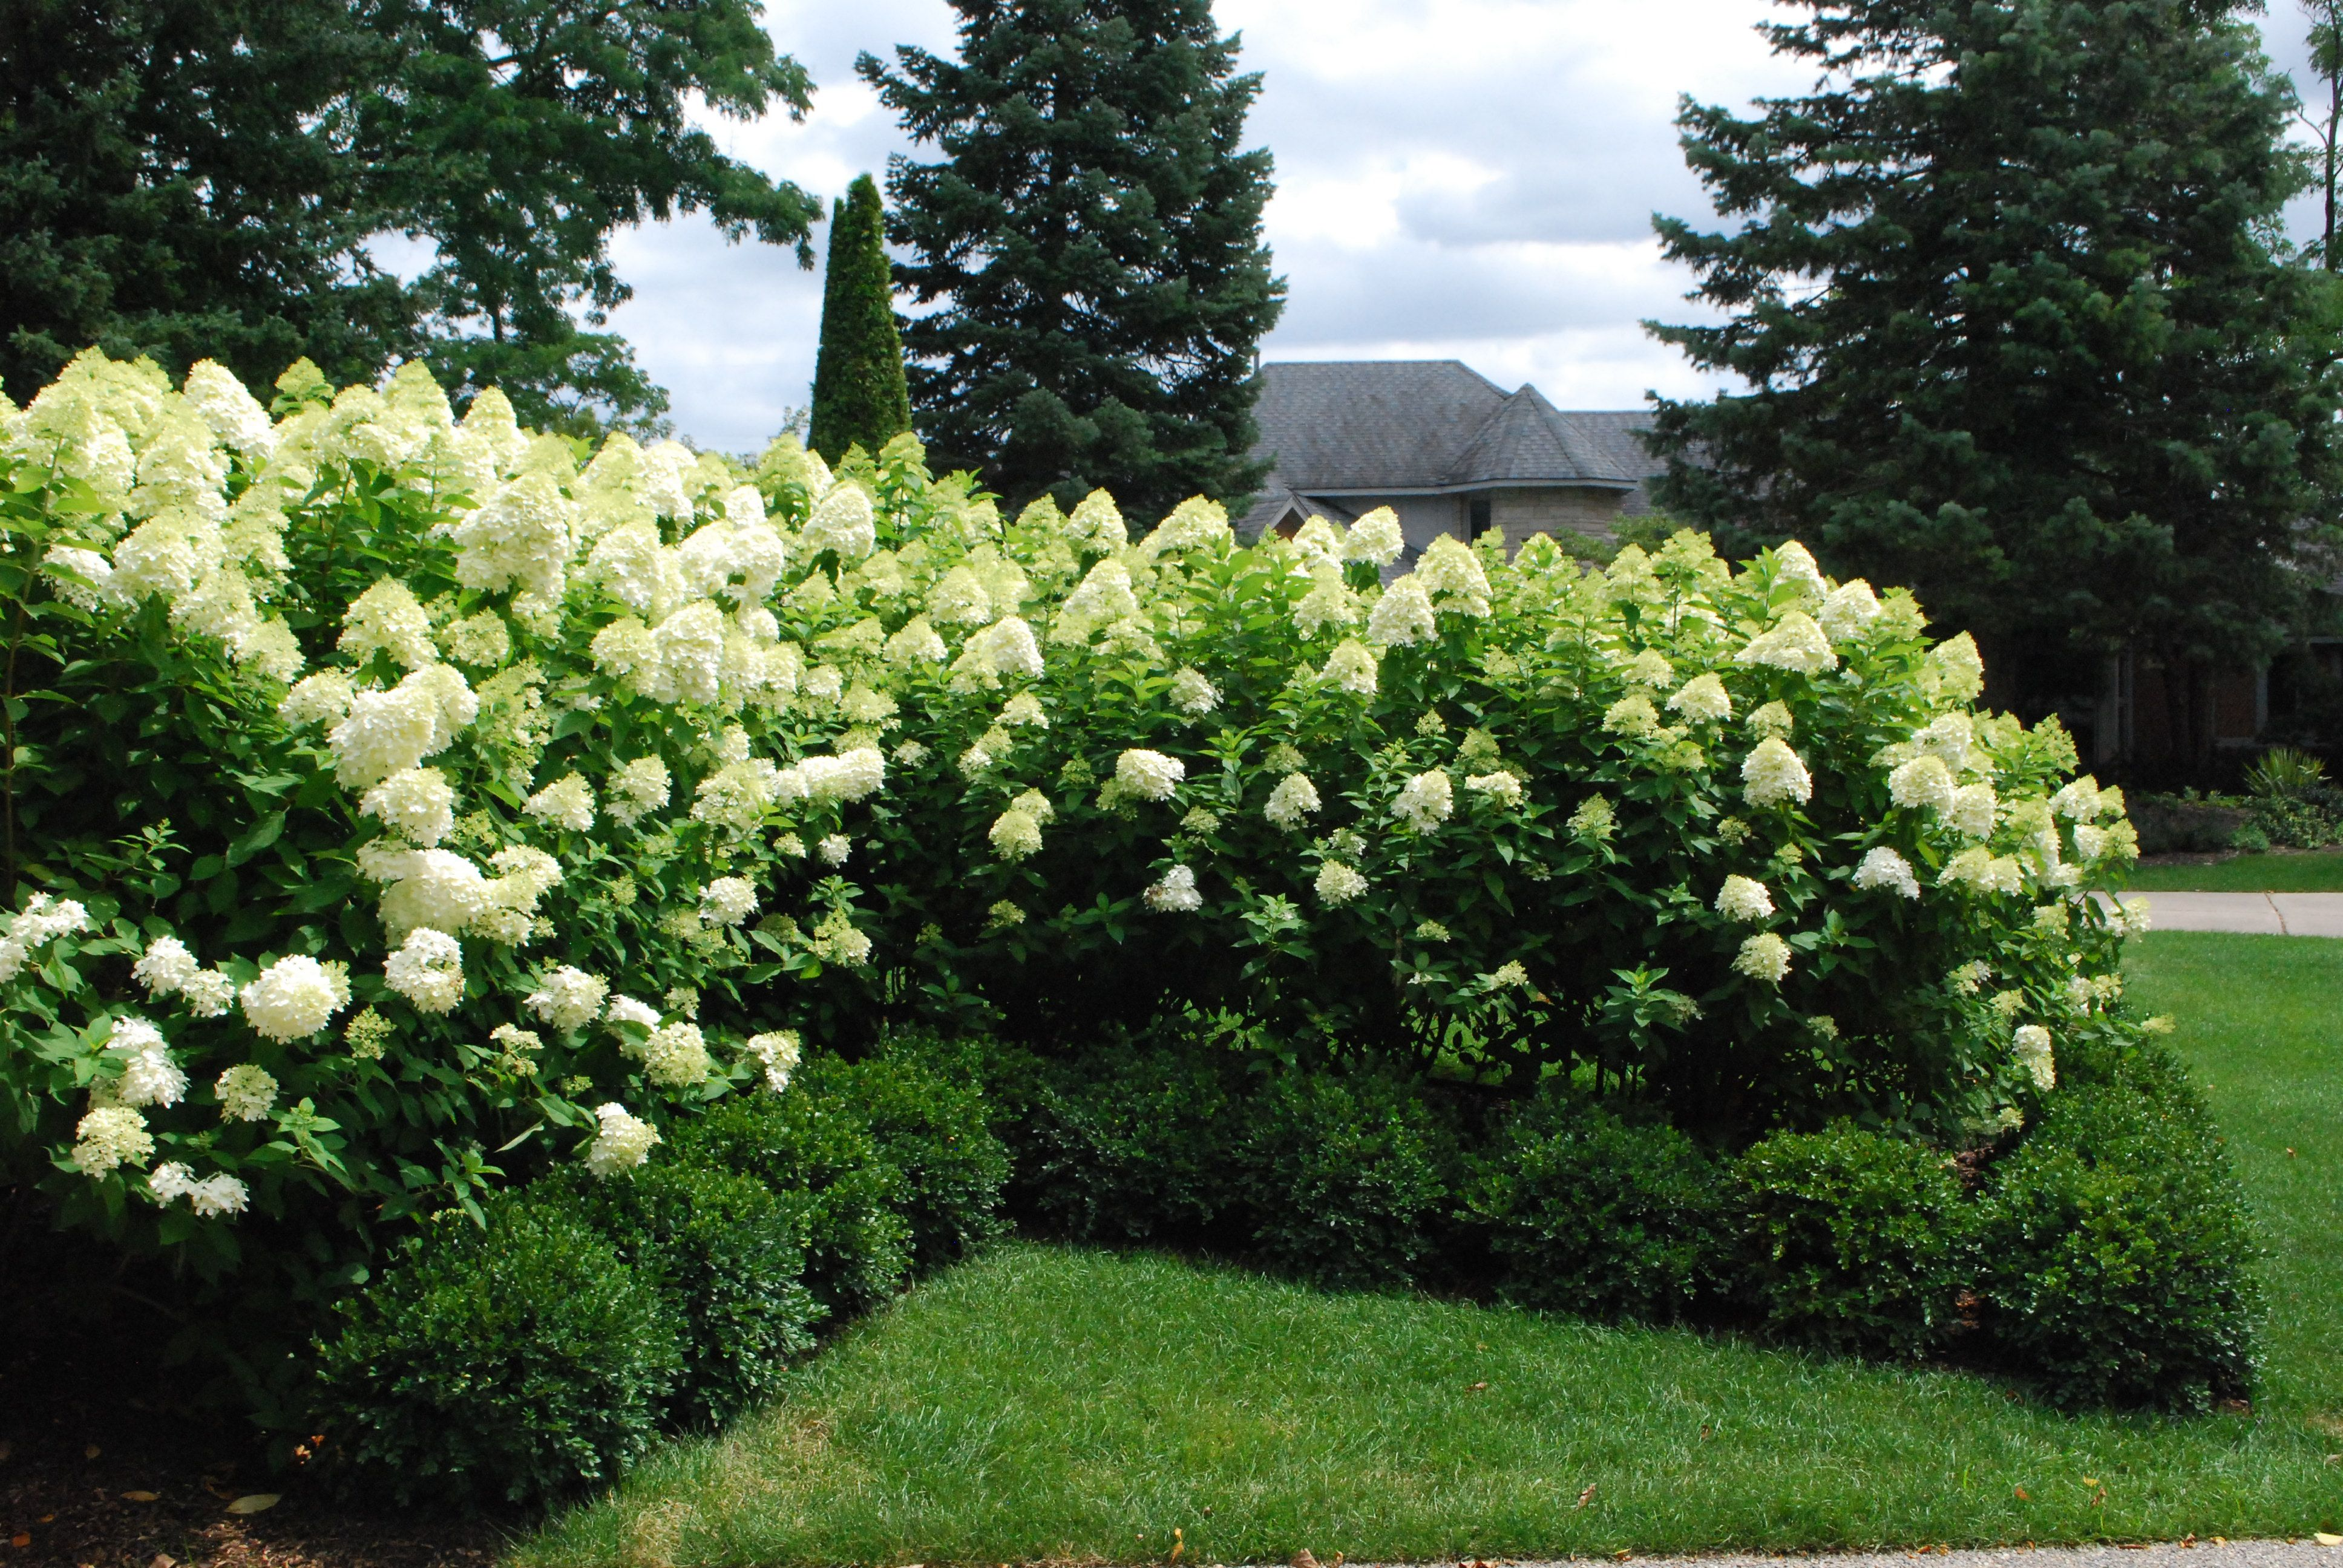 Limelight hydrangeas landscaping ideas annabelle for Limelight hydrangea